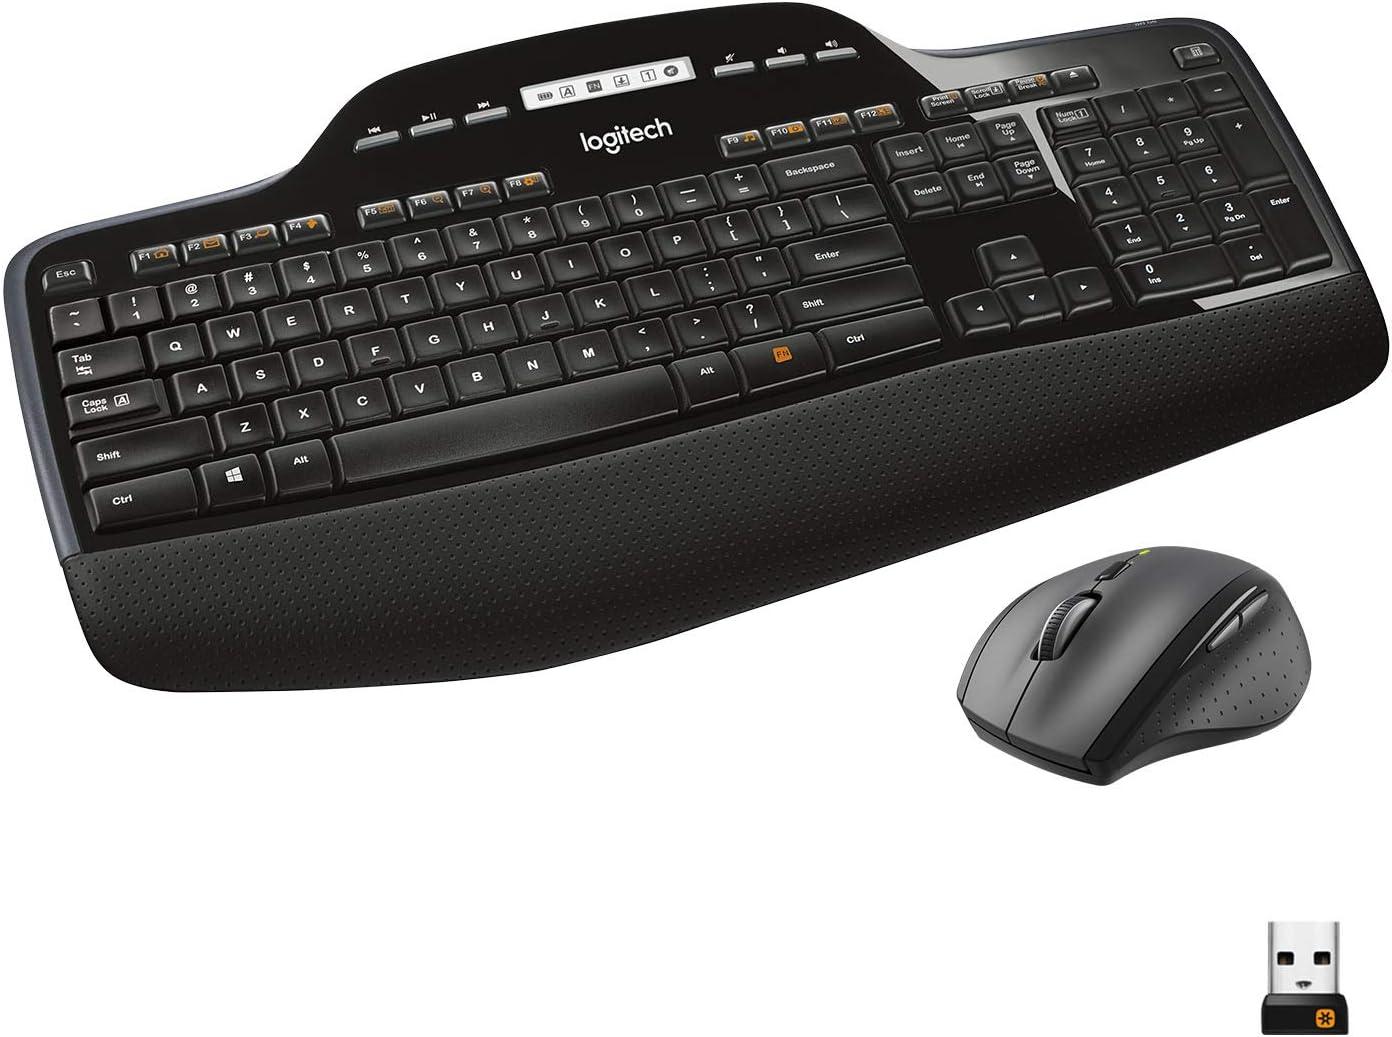 Logitech MK735 Performance Wireless Keyboard & Mouse Combo